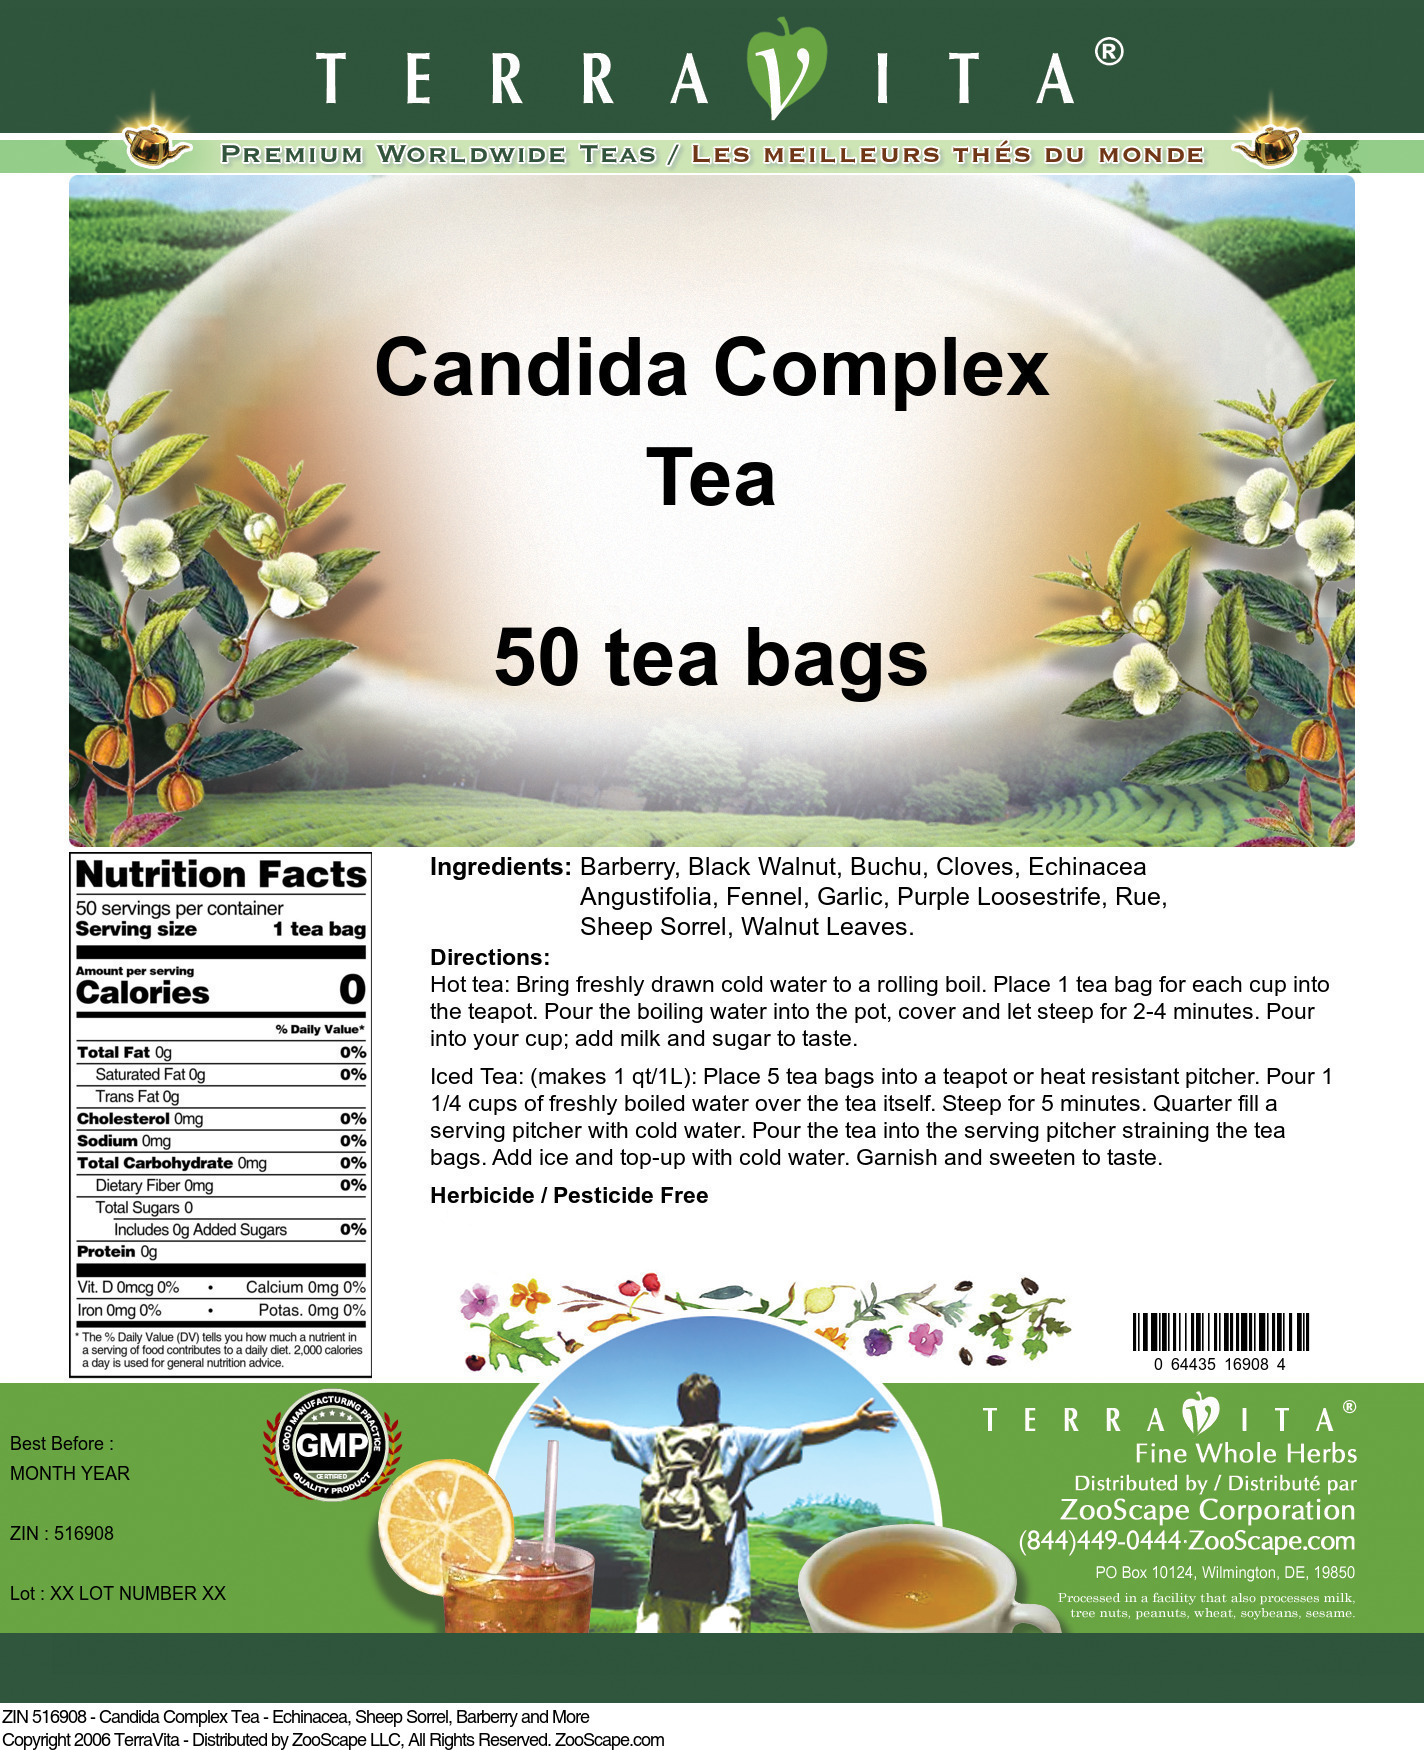 Candida Complex